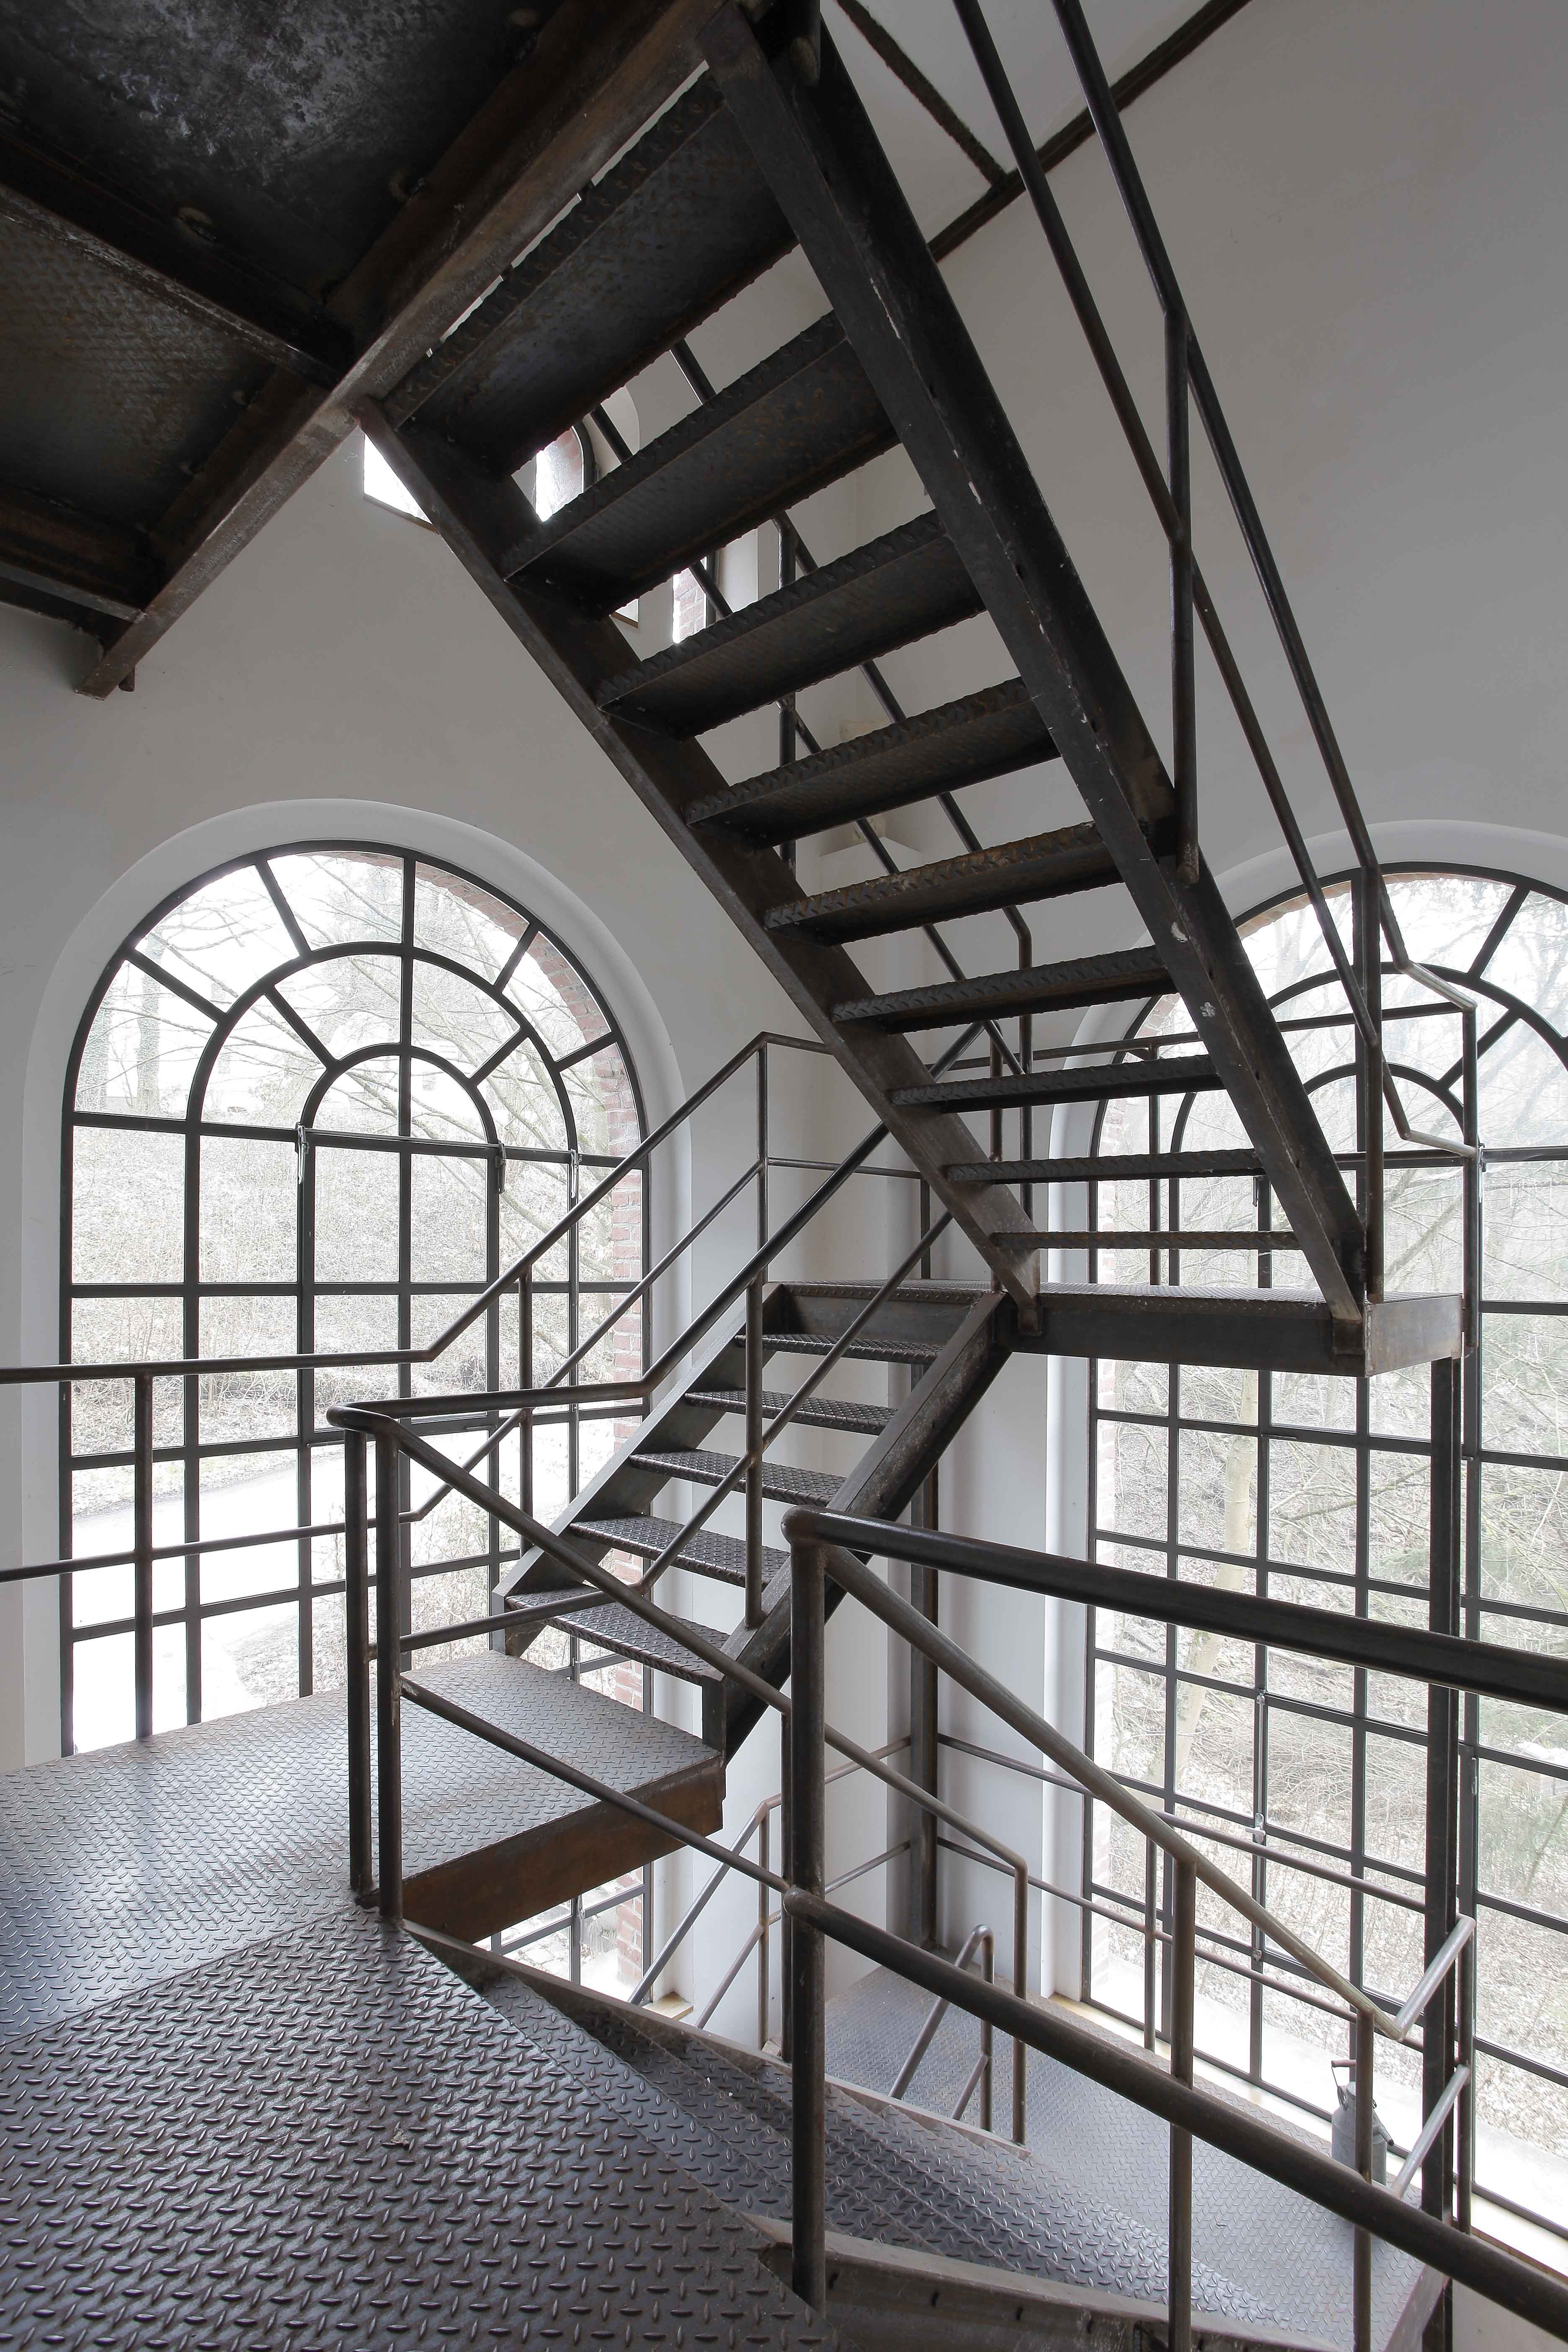 http://architektur-anders.de/wp-content/uploads/2018/06/Bodo-Mertoglu_20120314_1603.jpg